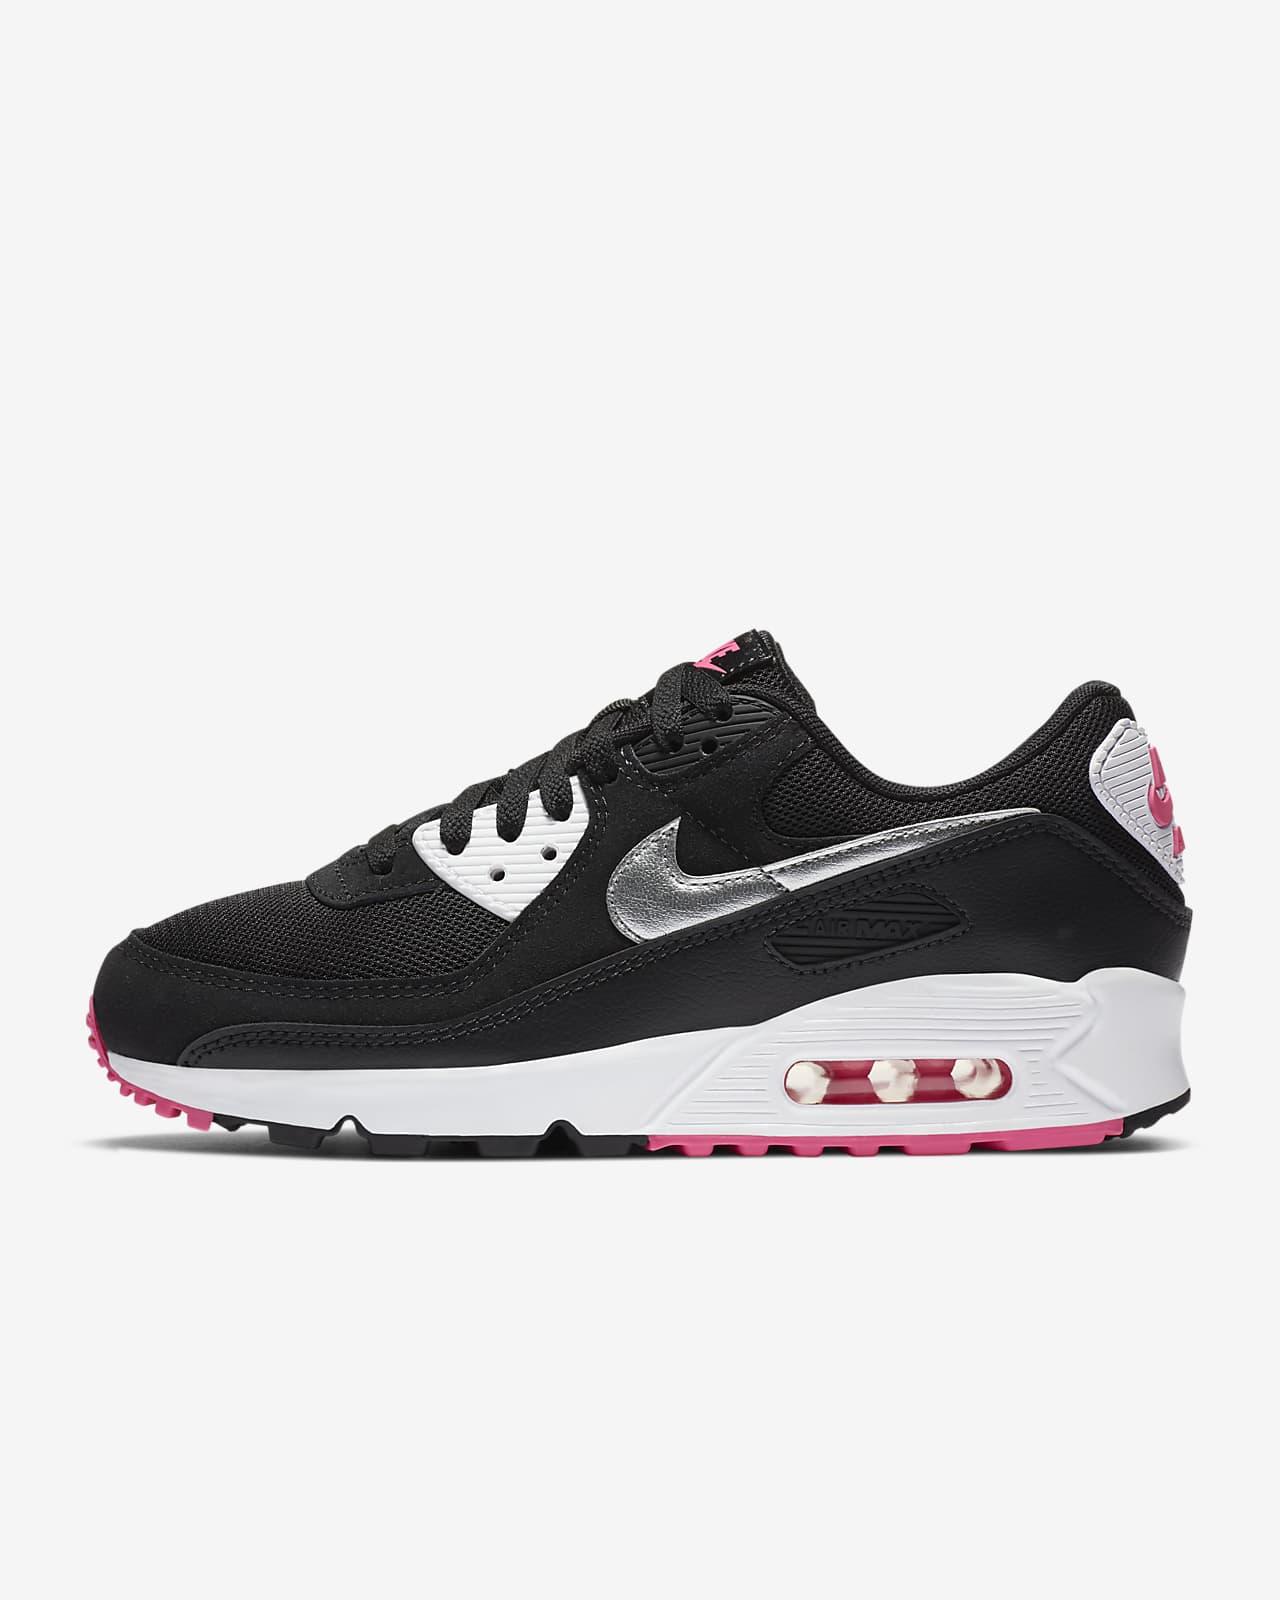 Nike Air Max 90 Women's Shoe. Nike BG